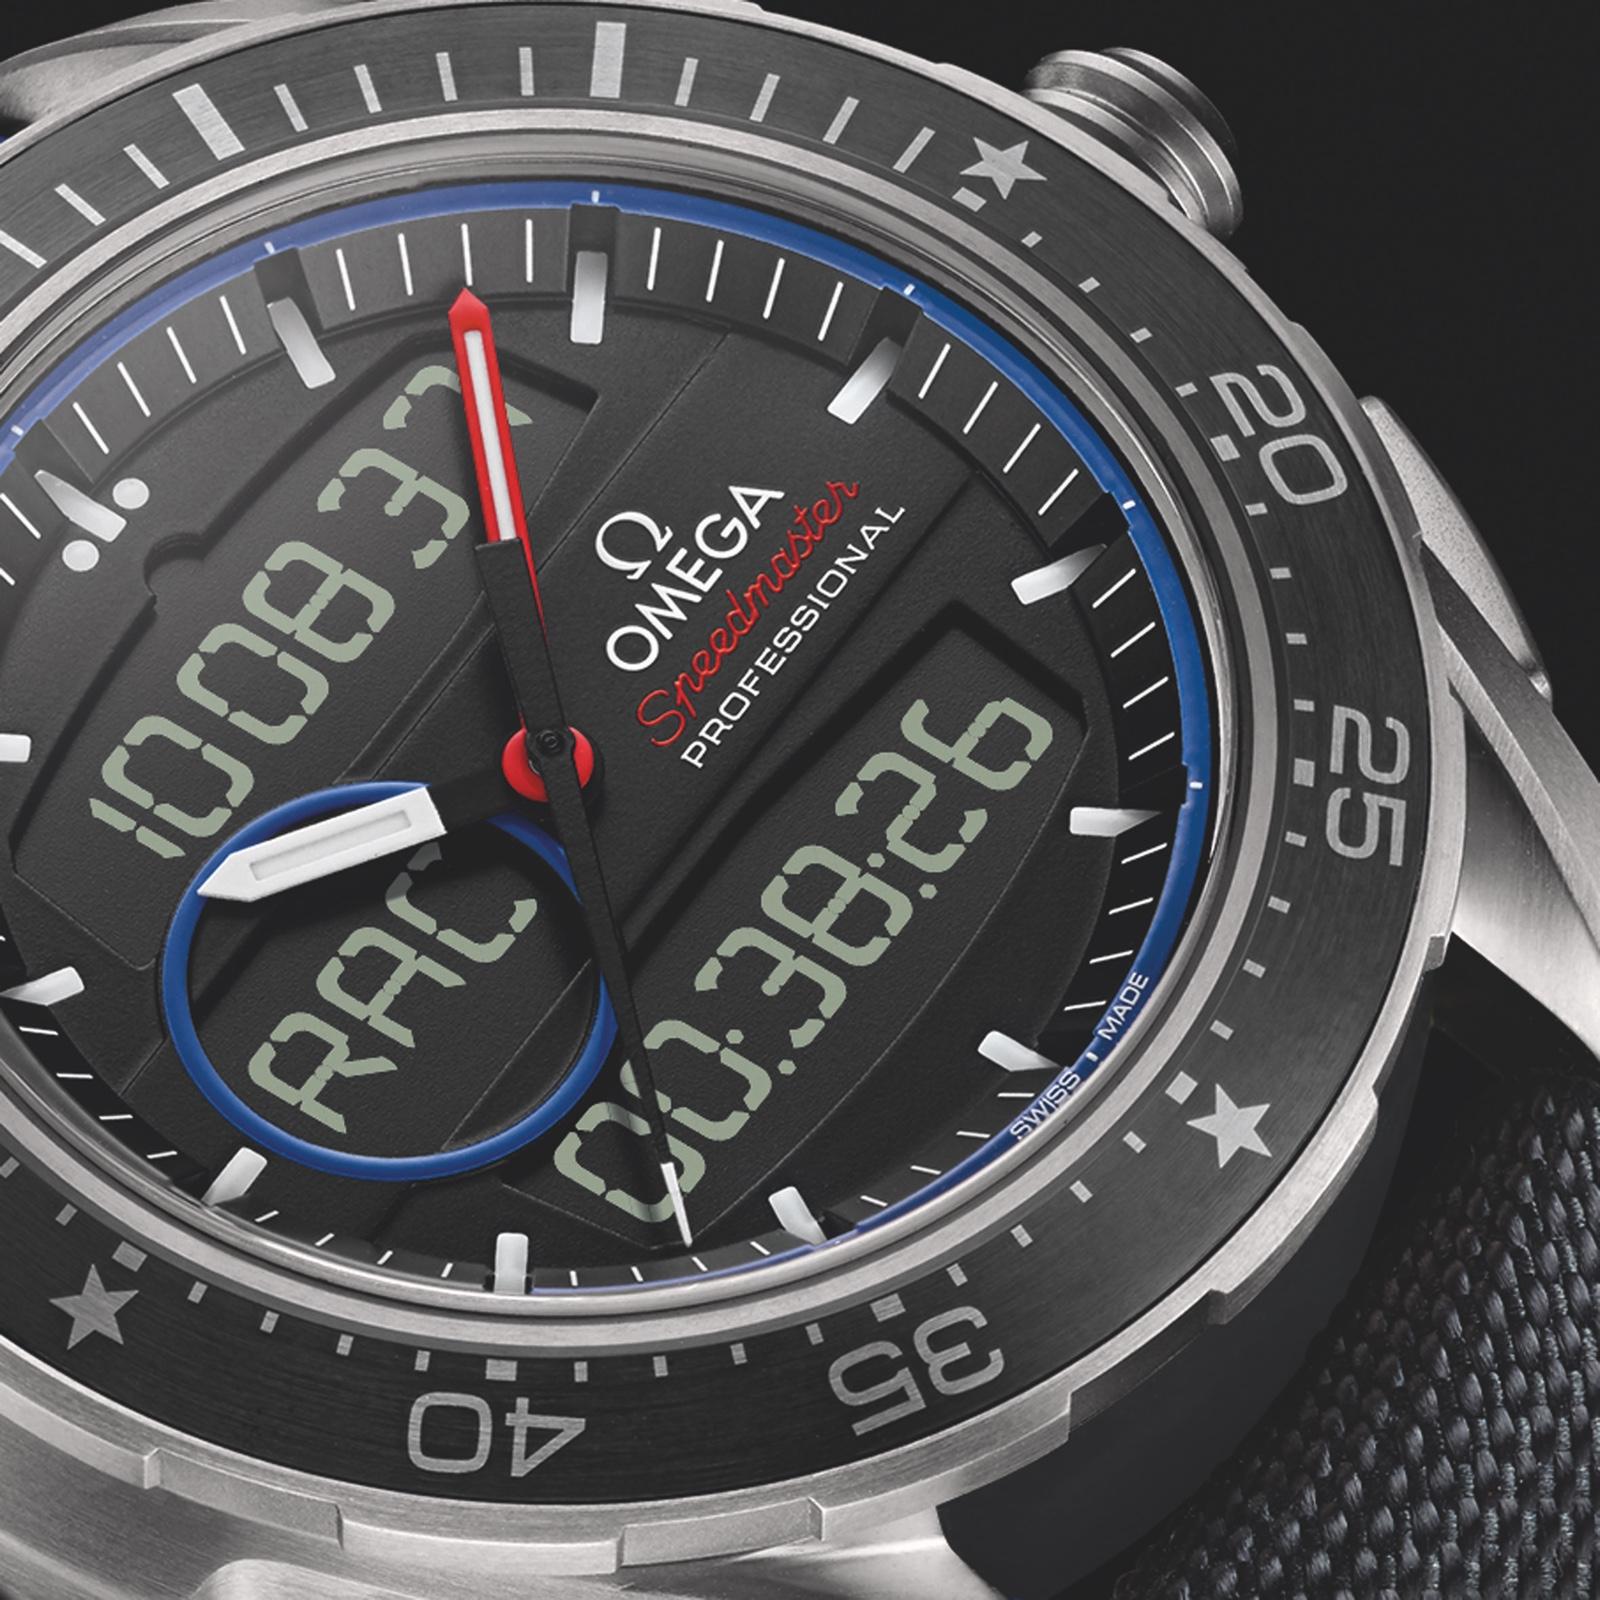 Omega ETNZ Speedmaster X33 Detail